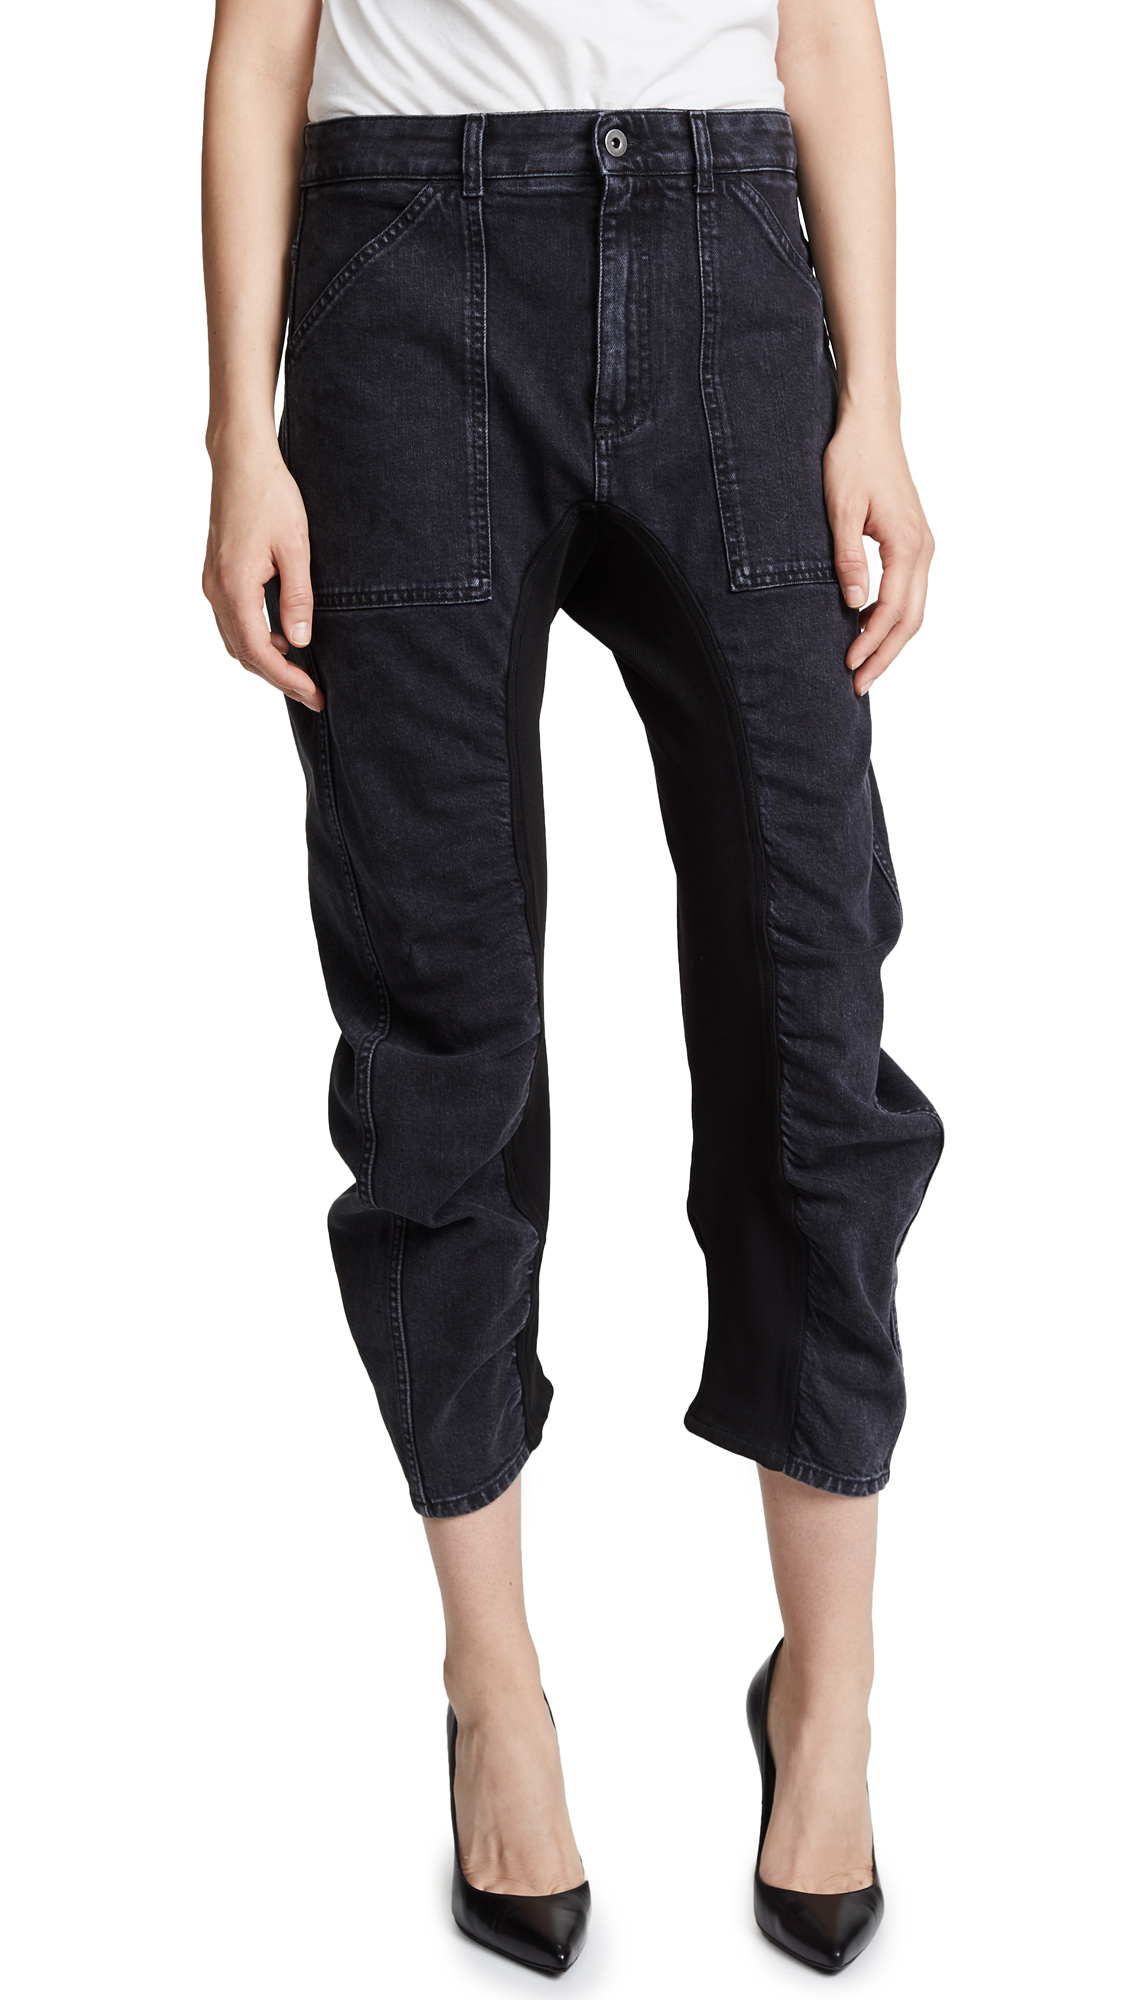 Stella McCartney Vintage Jeans In Black